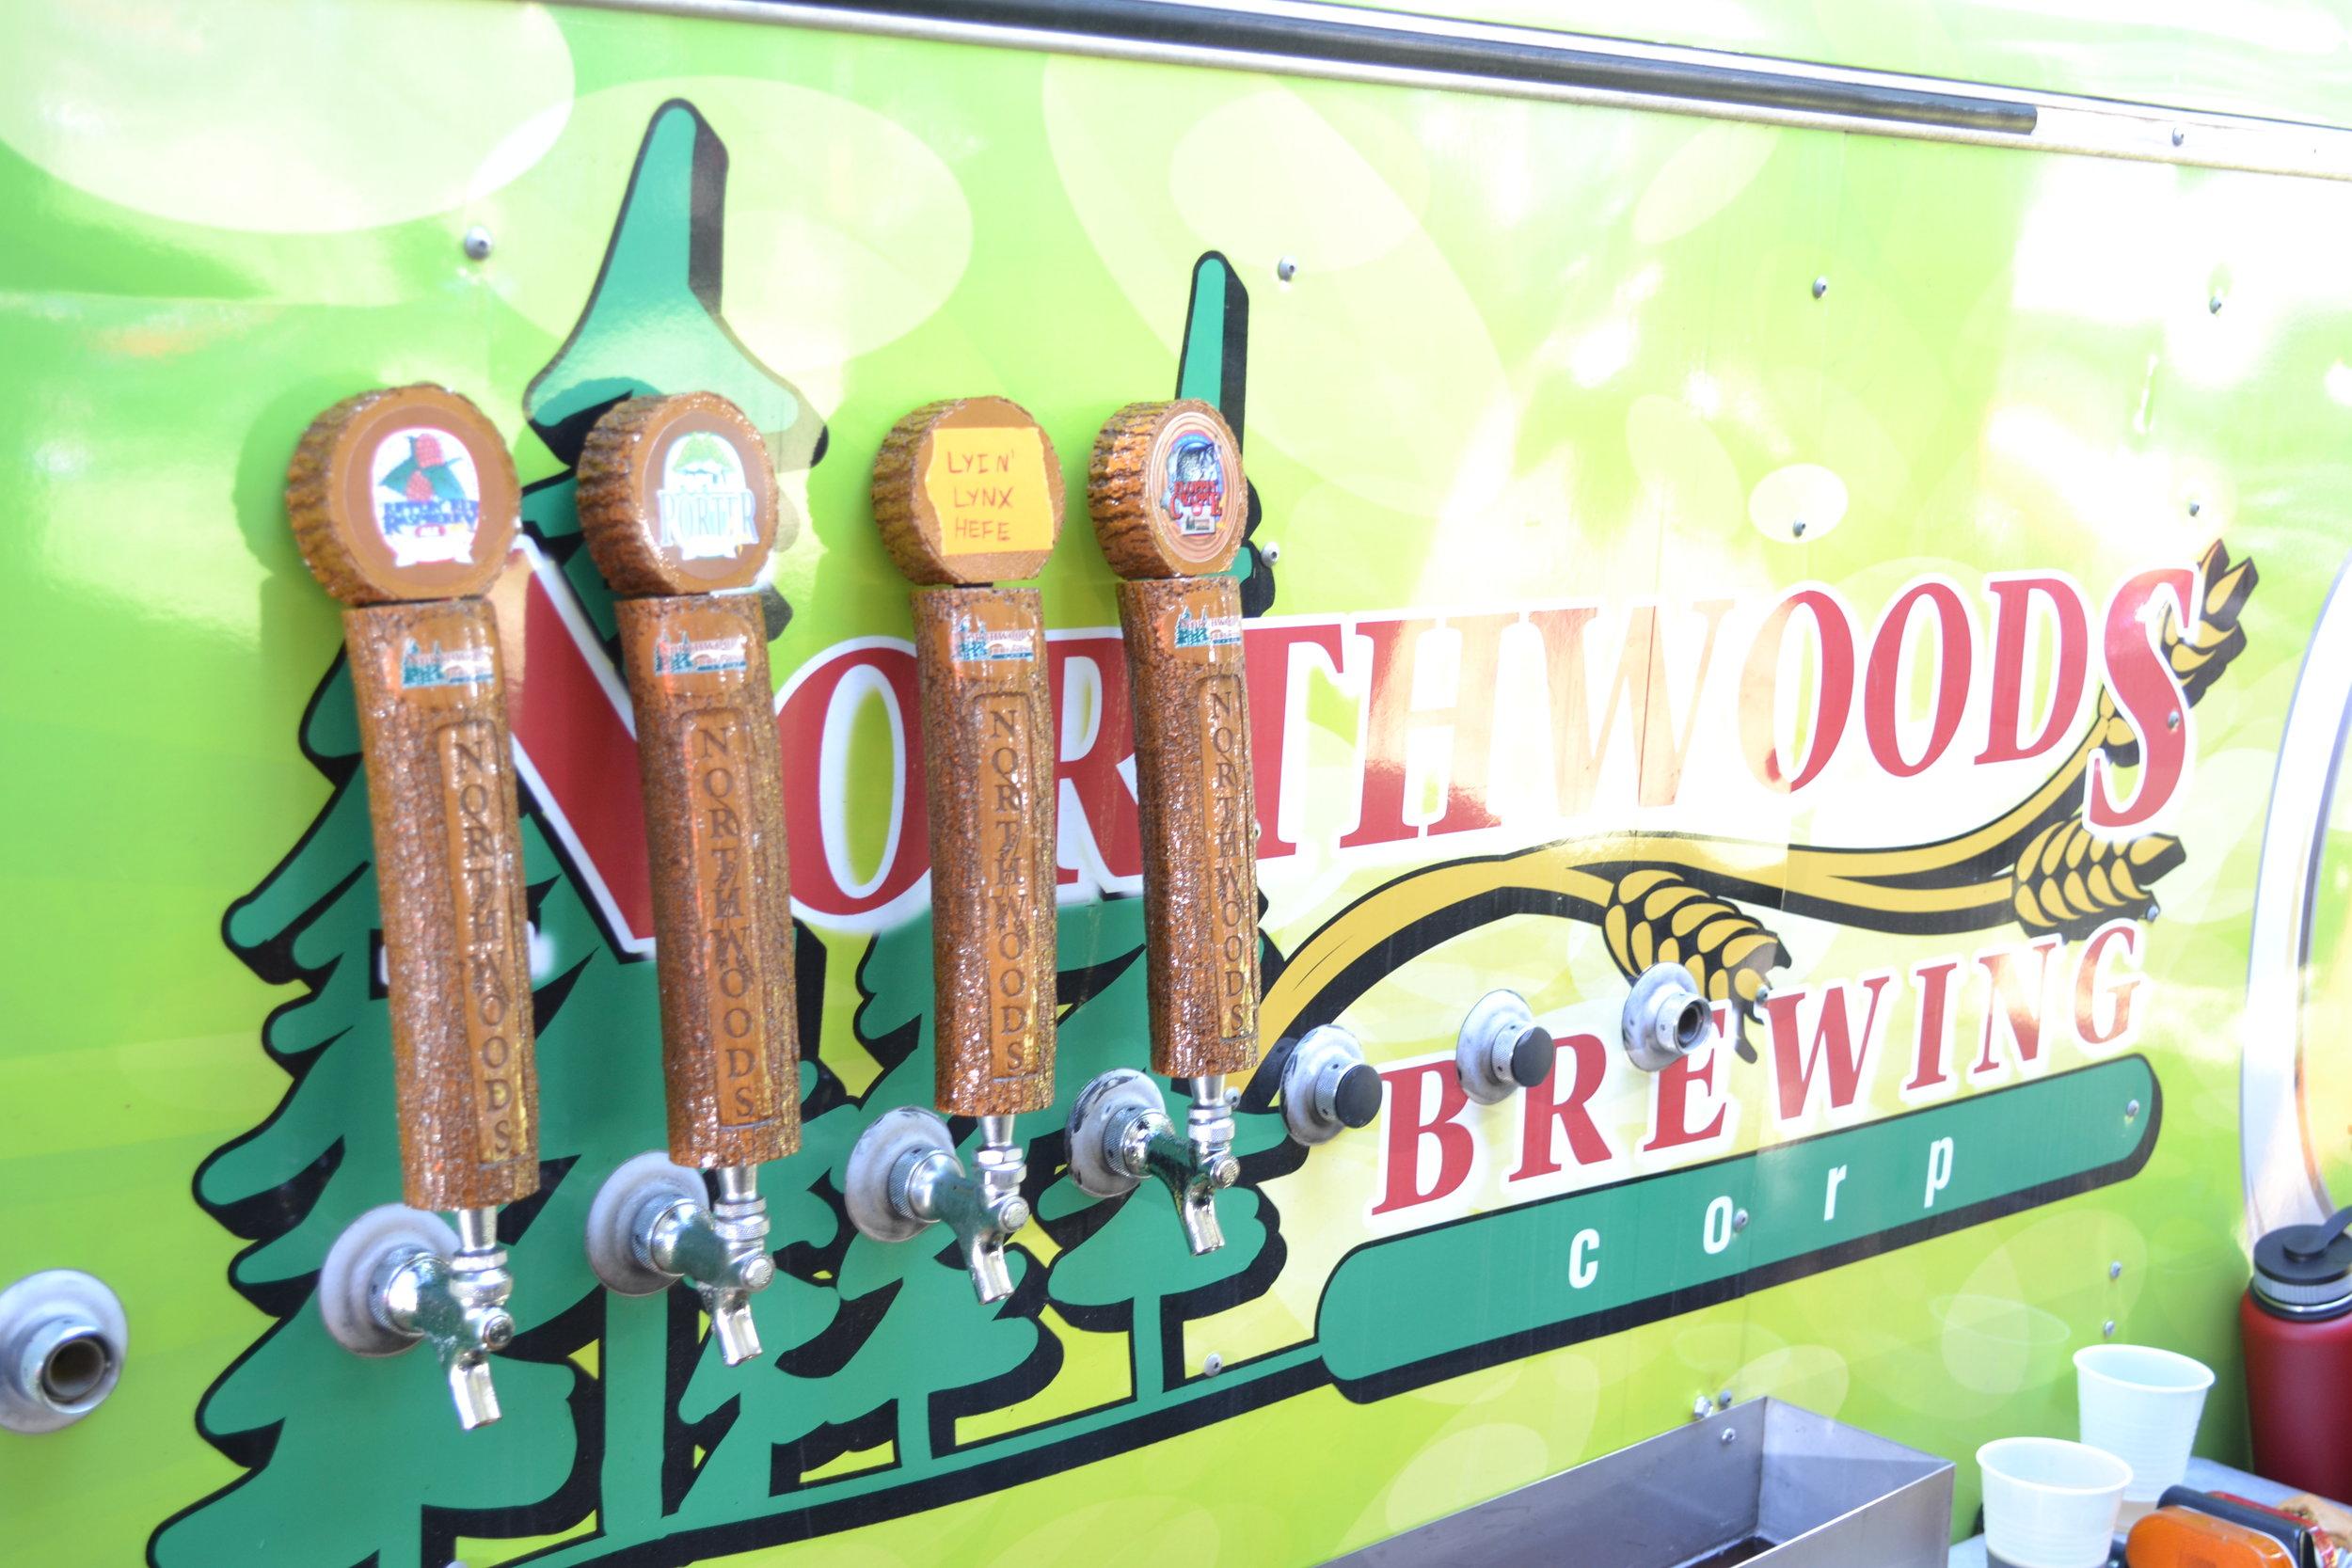 northwoods brewfest 2016.JPG